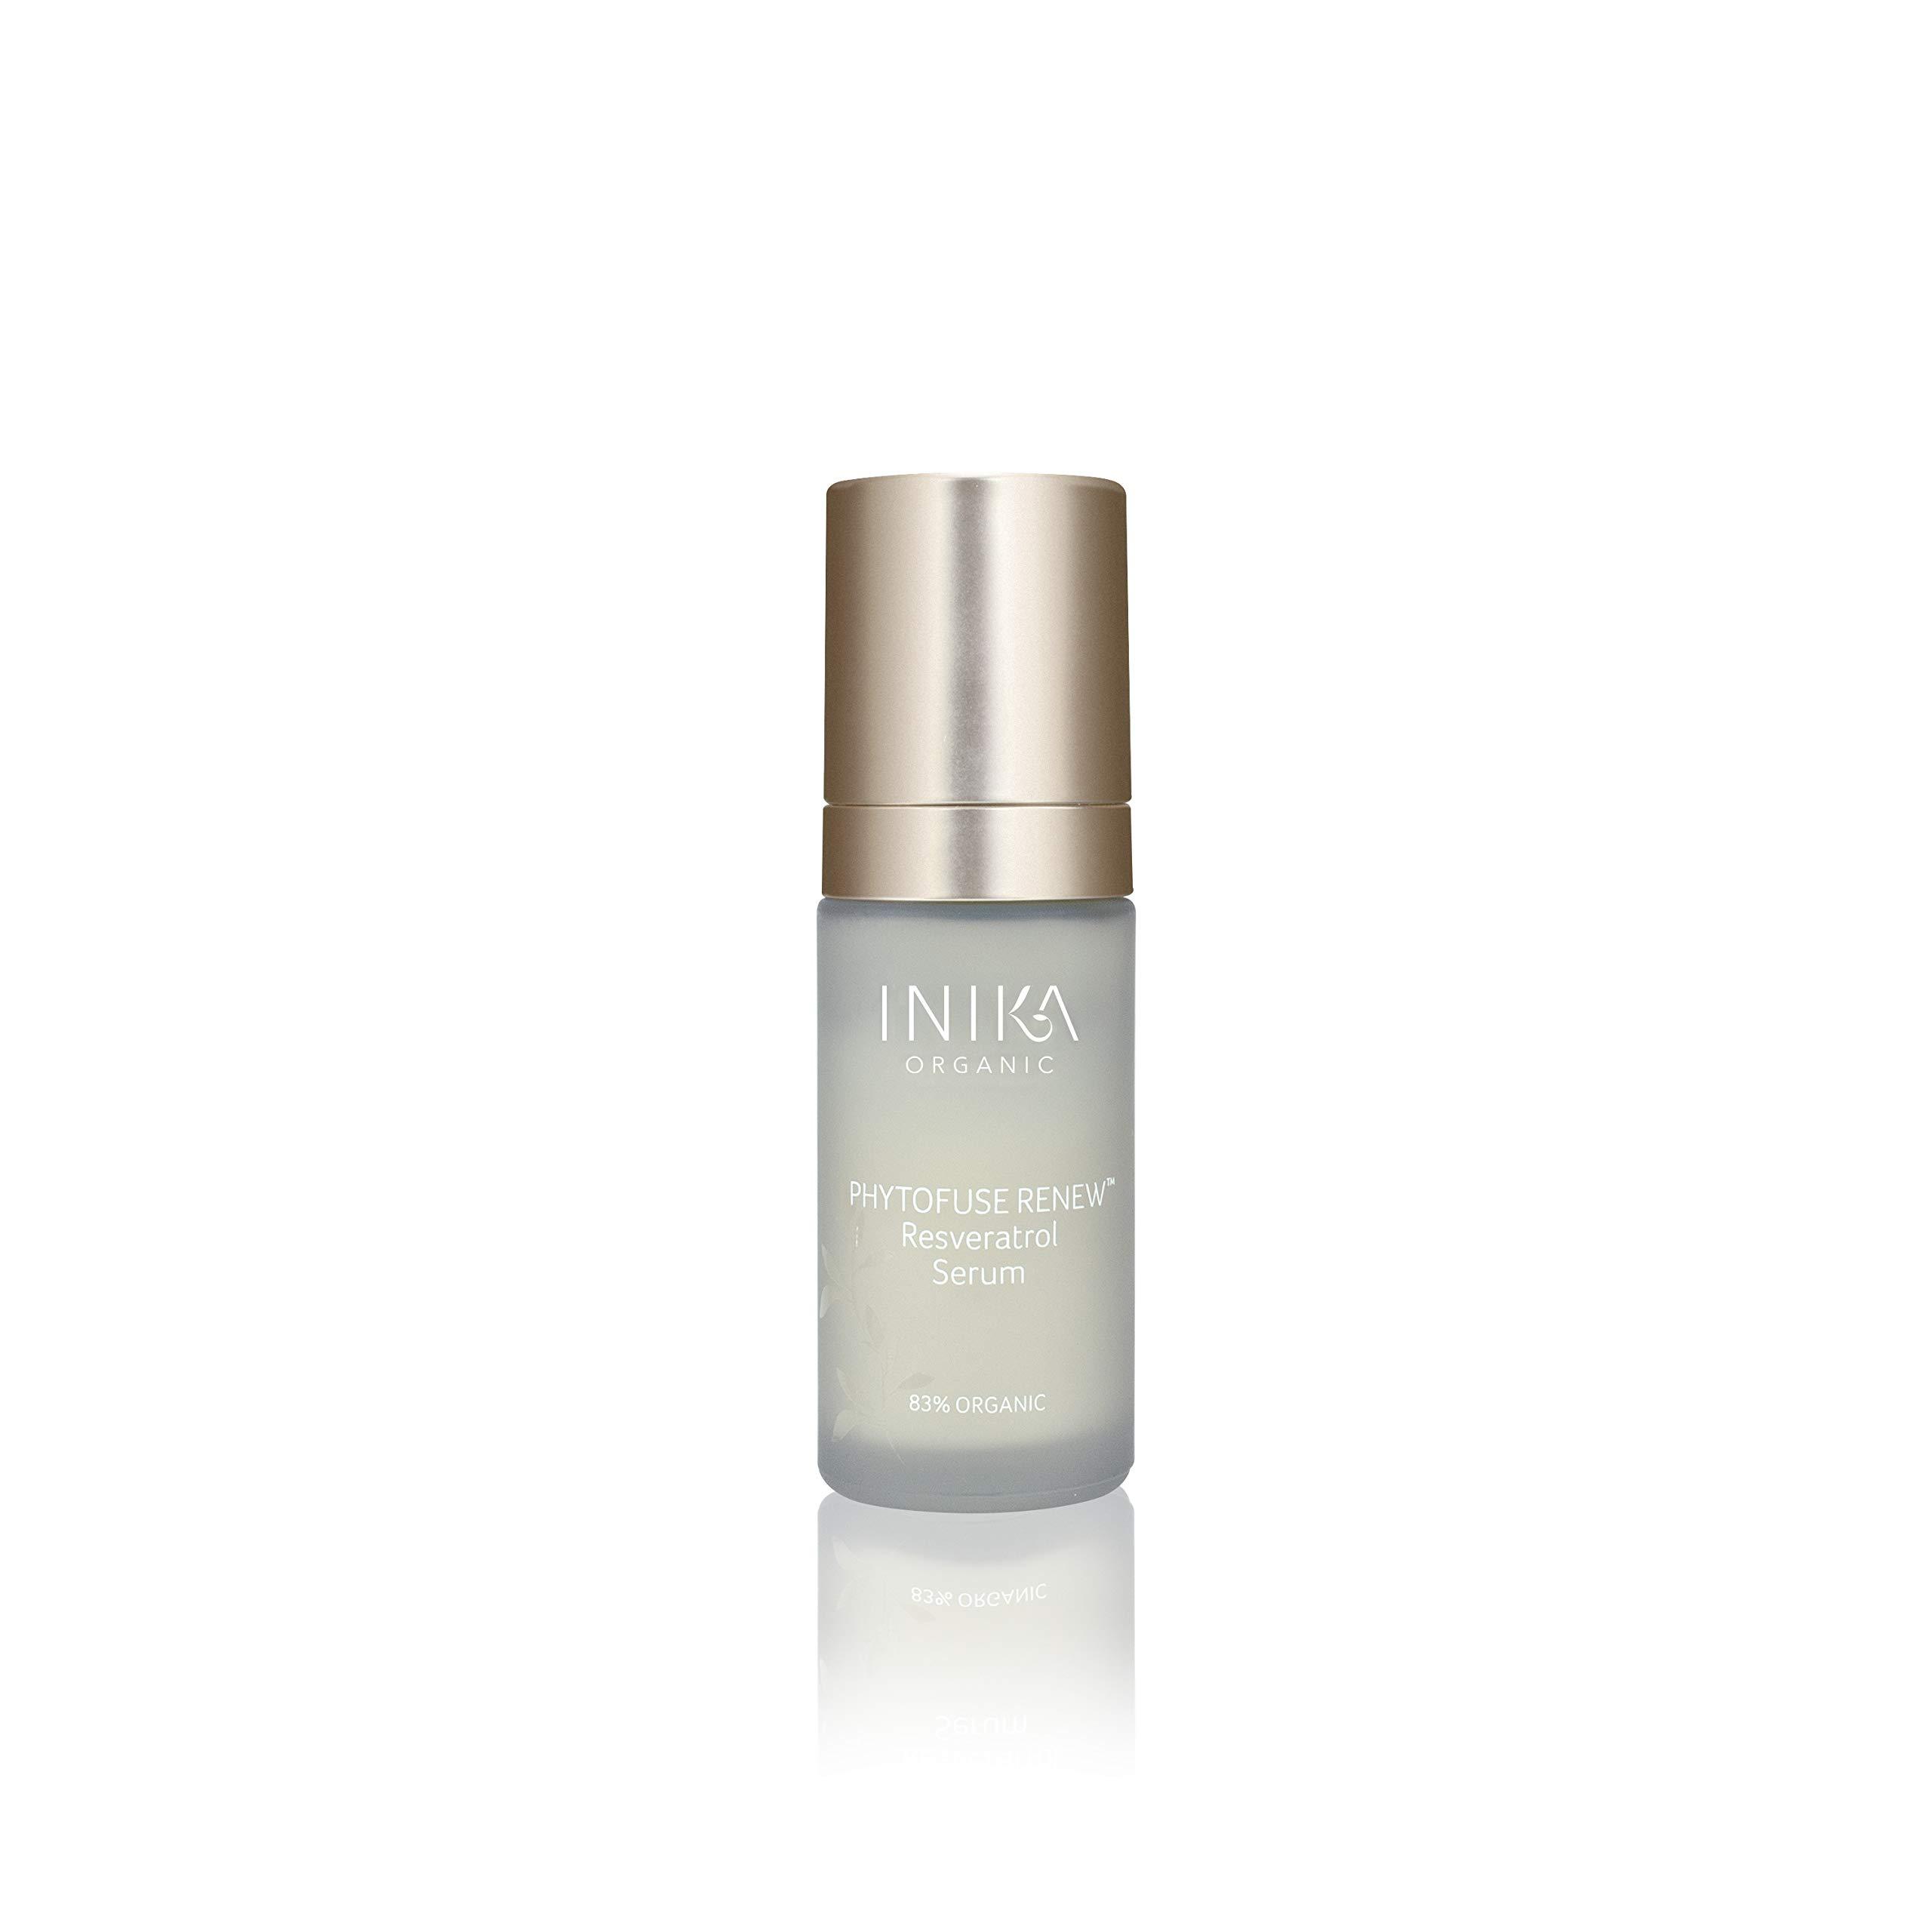 Inika Phytofuse Renew Resveratrol Serum Anti Aging Skin Radiance